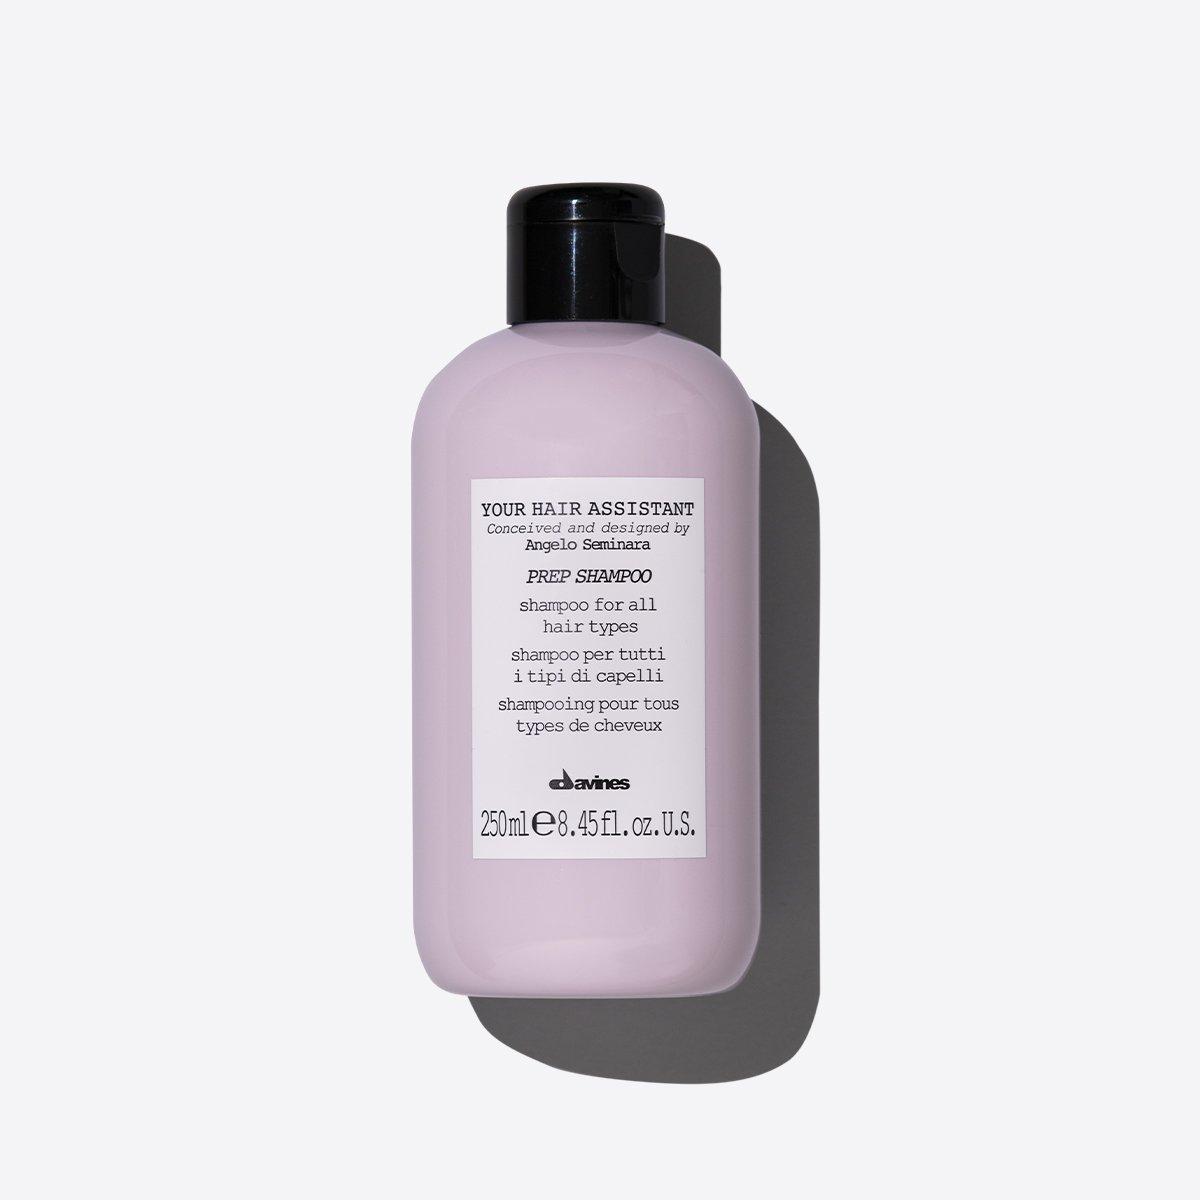 YOUR HAIR ASSISTANT Prep Shampoo  250ml